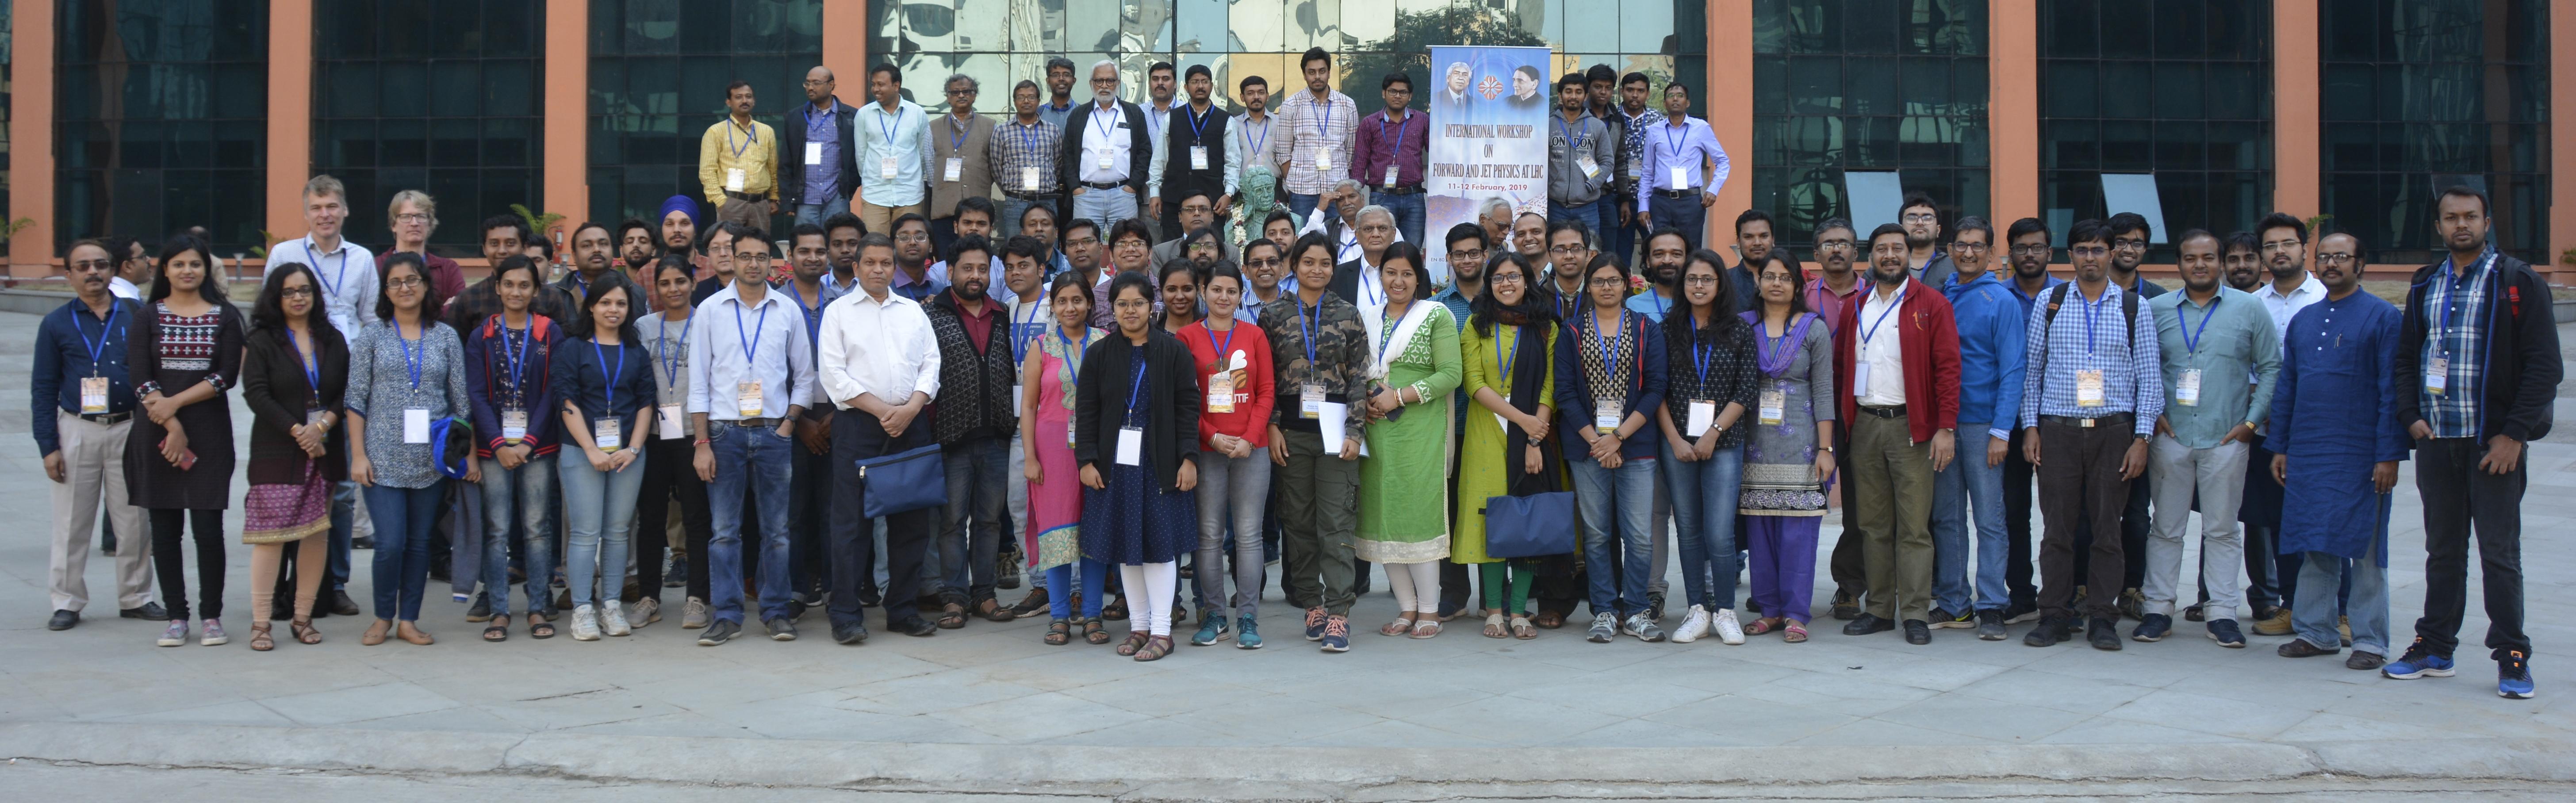 International Workshop On Forward and Jet Physics at LHC